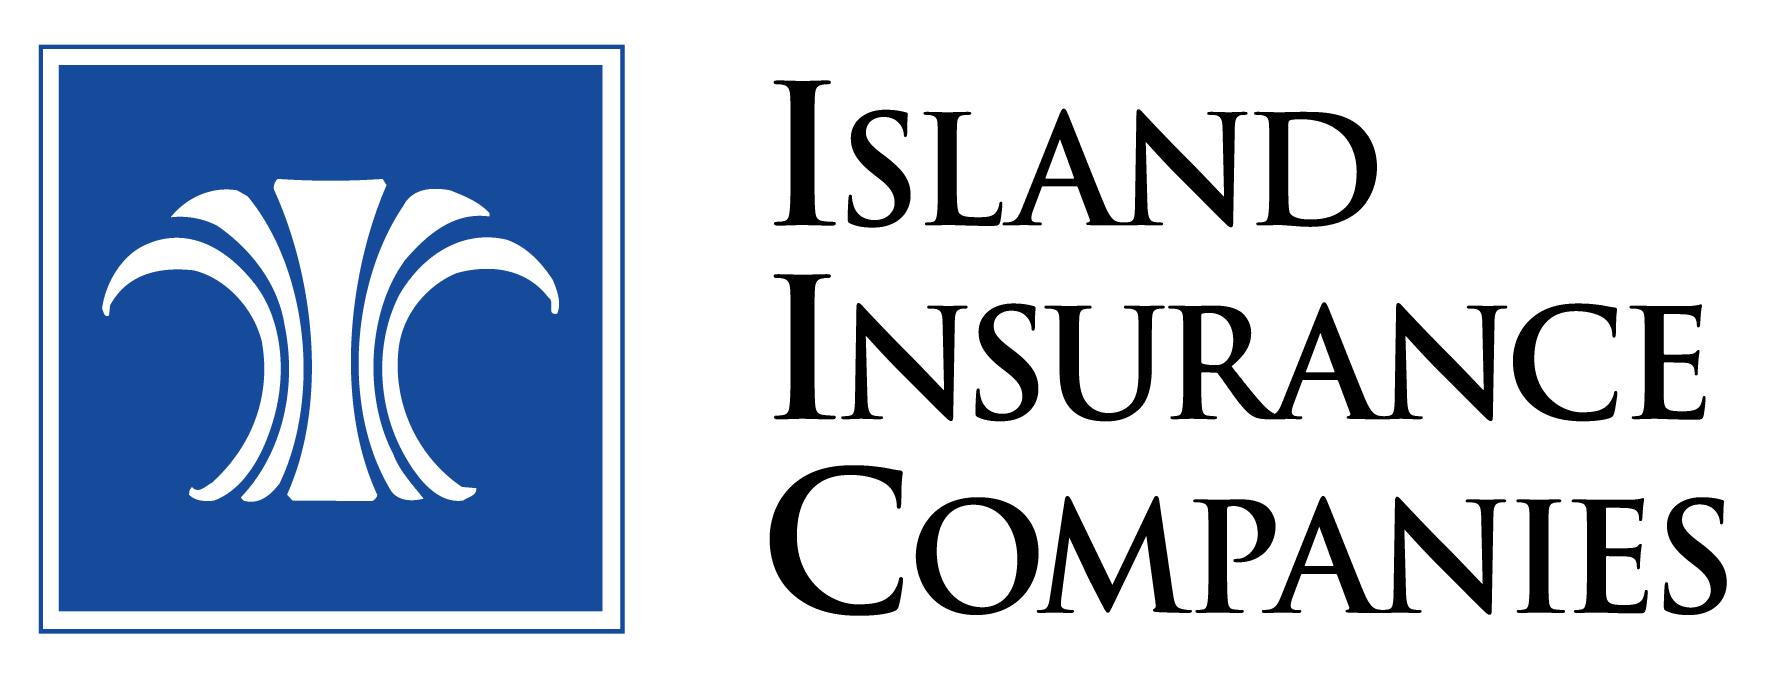 Island Insurance